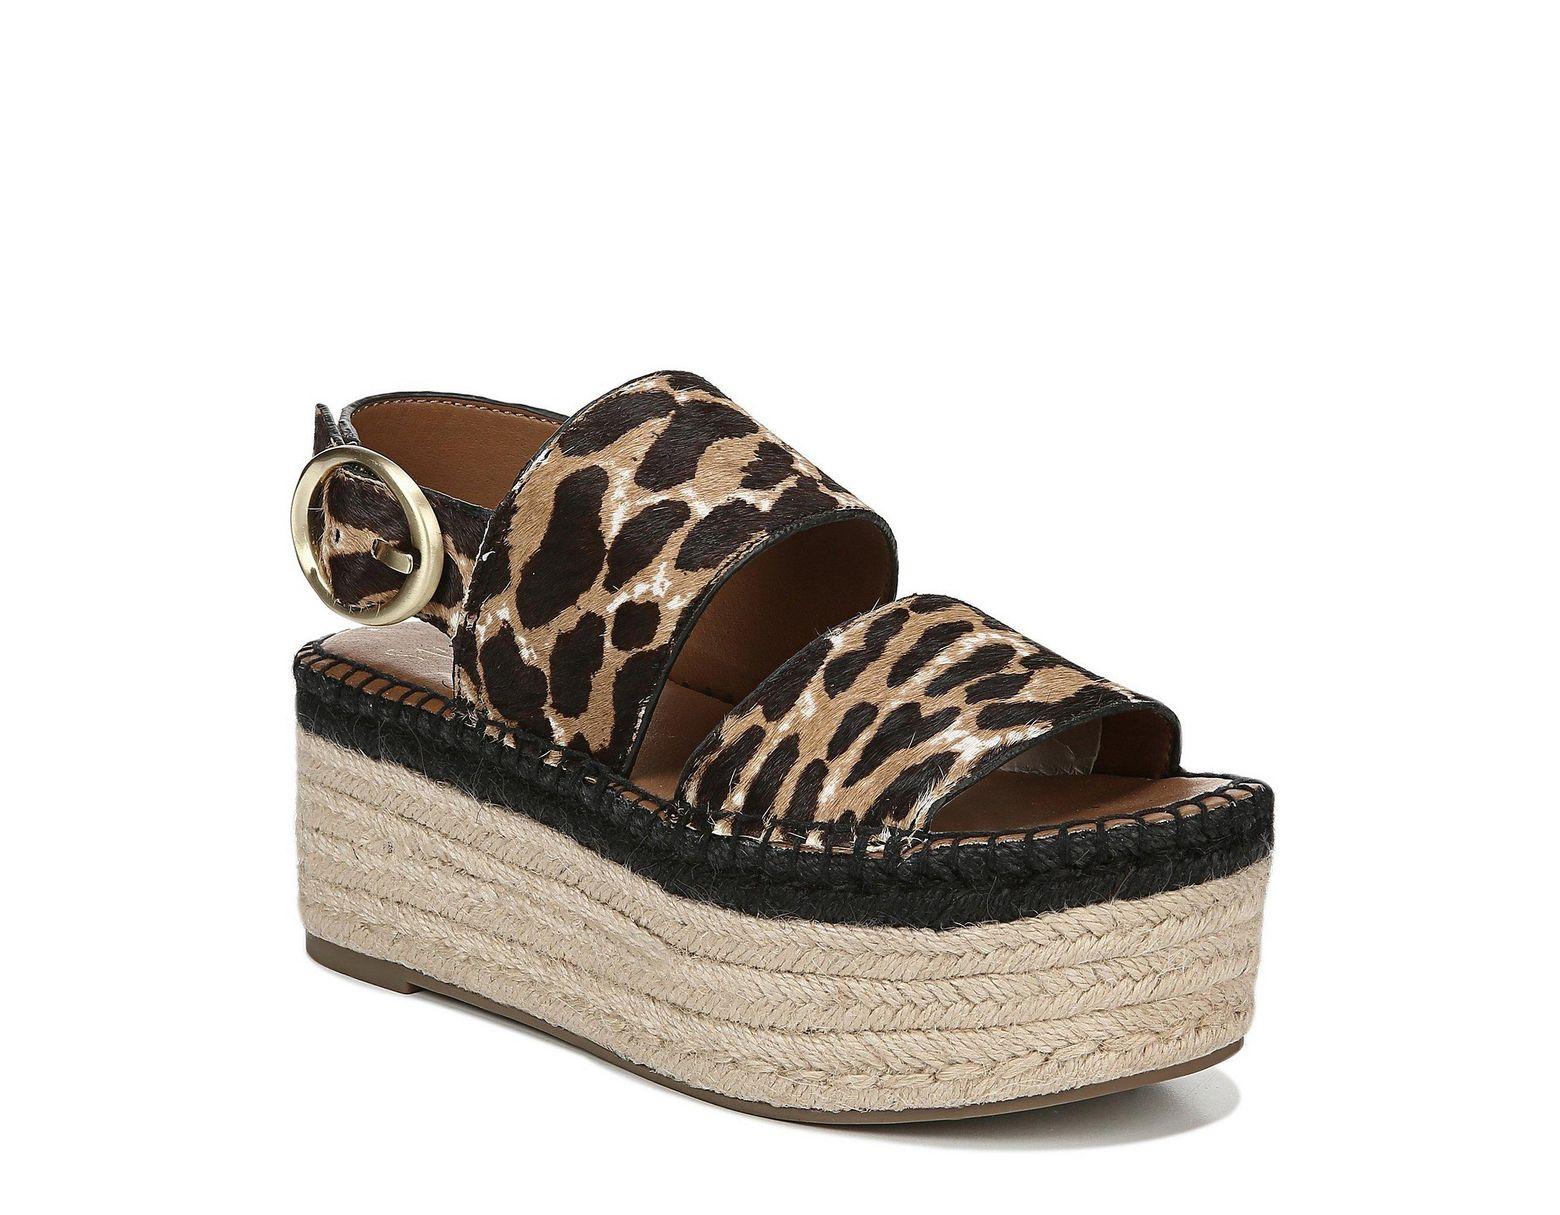 a423583508d Women's Brown Sarto By Mariana Leopard Print Calf Hair Espadrille Flatform  Sandals